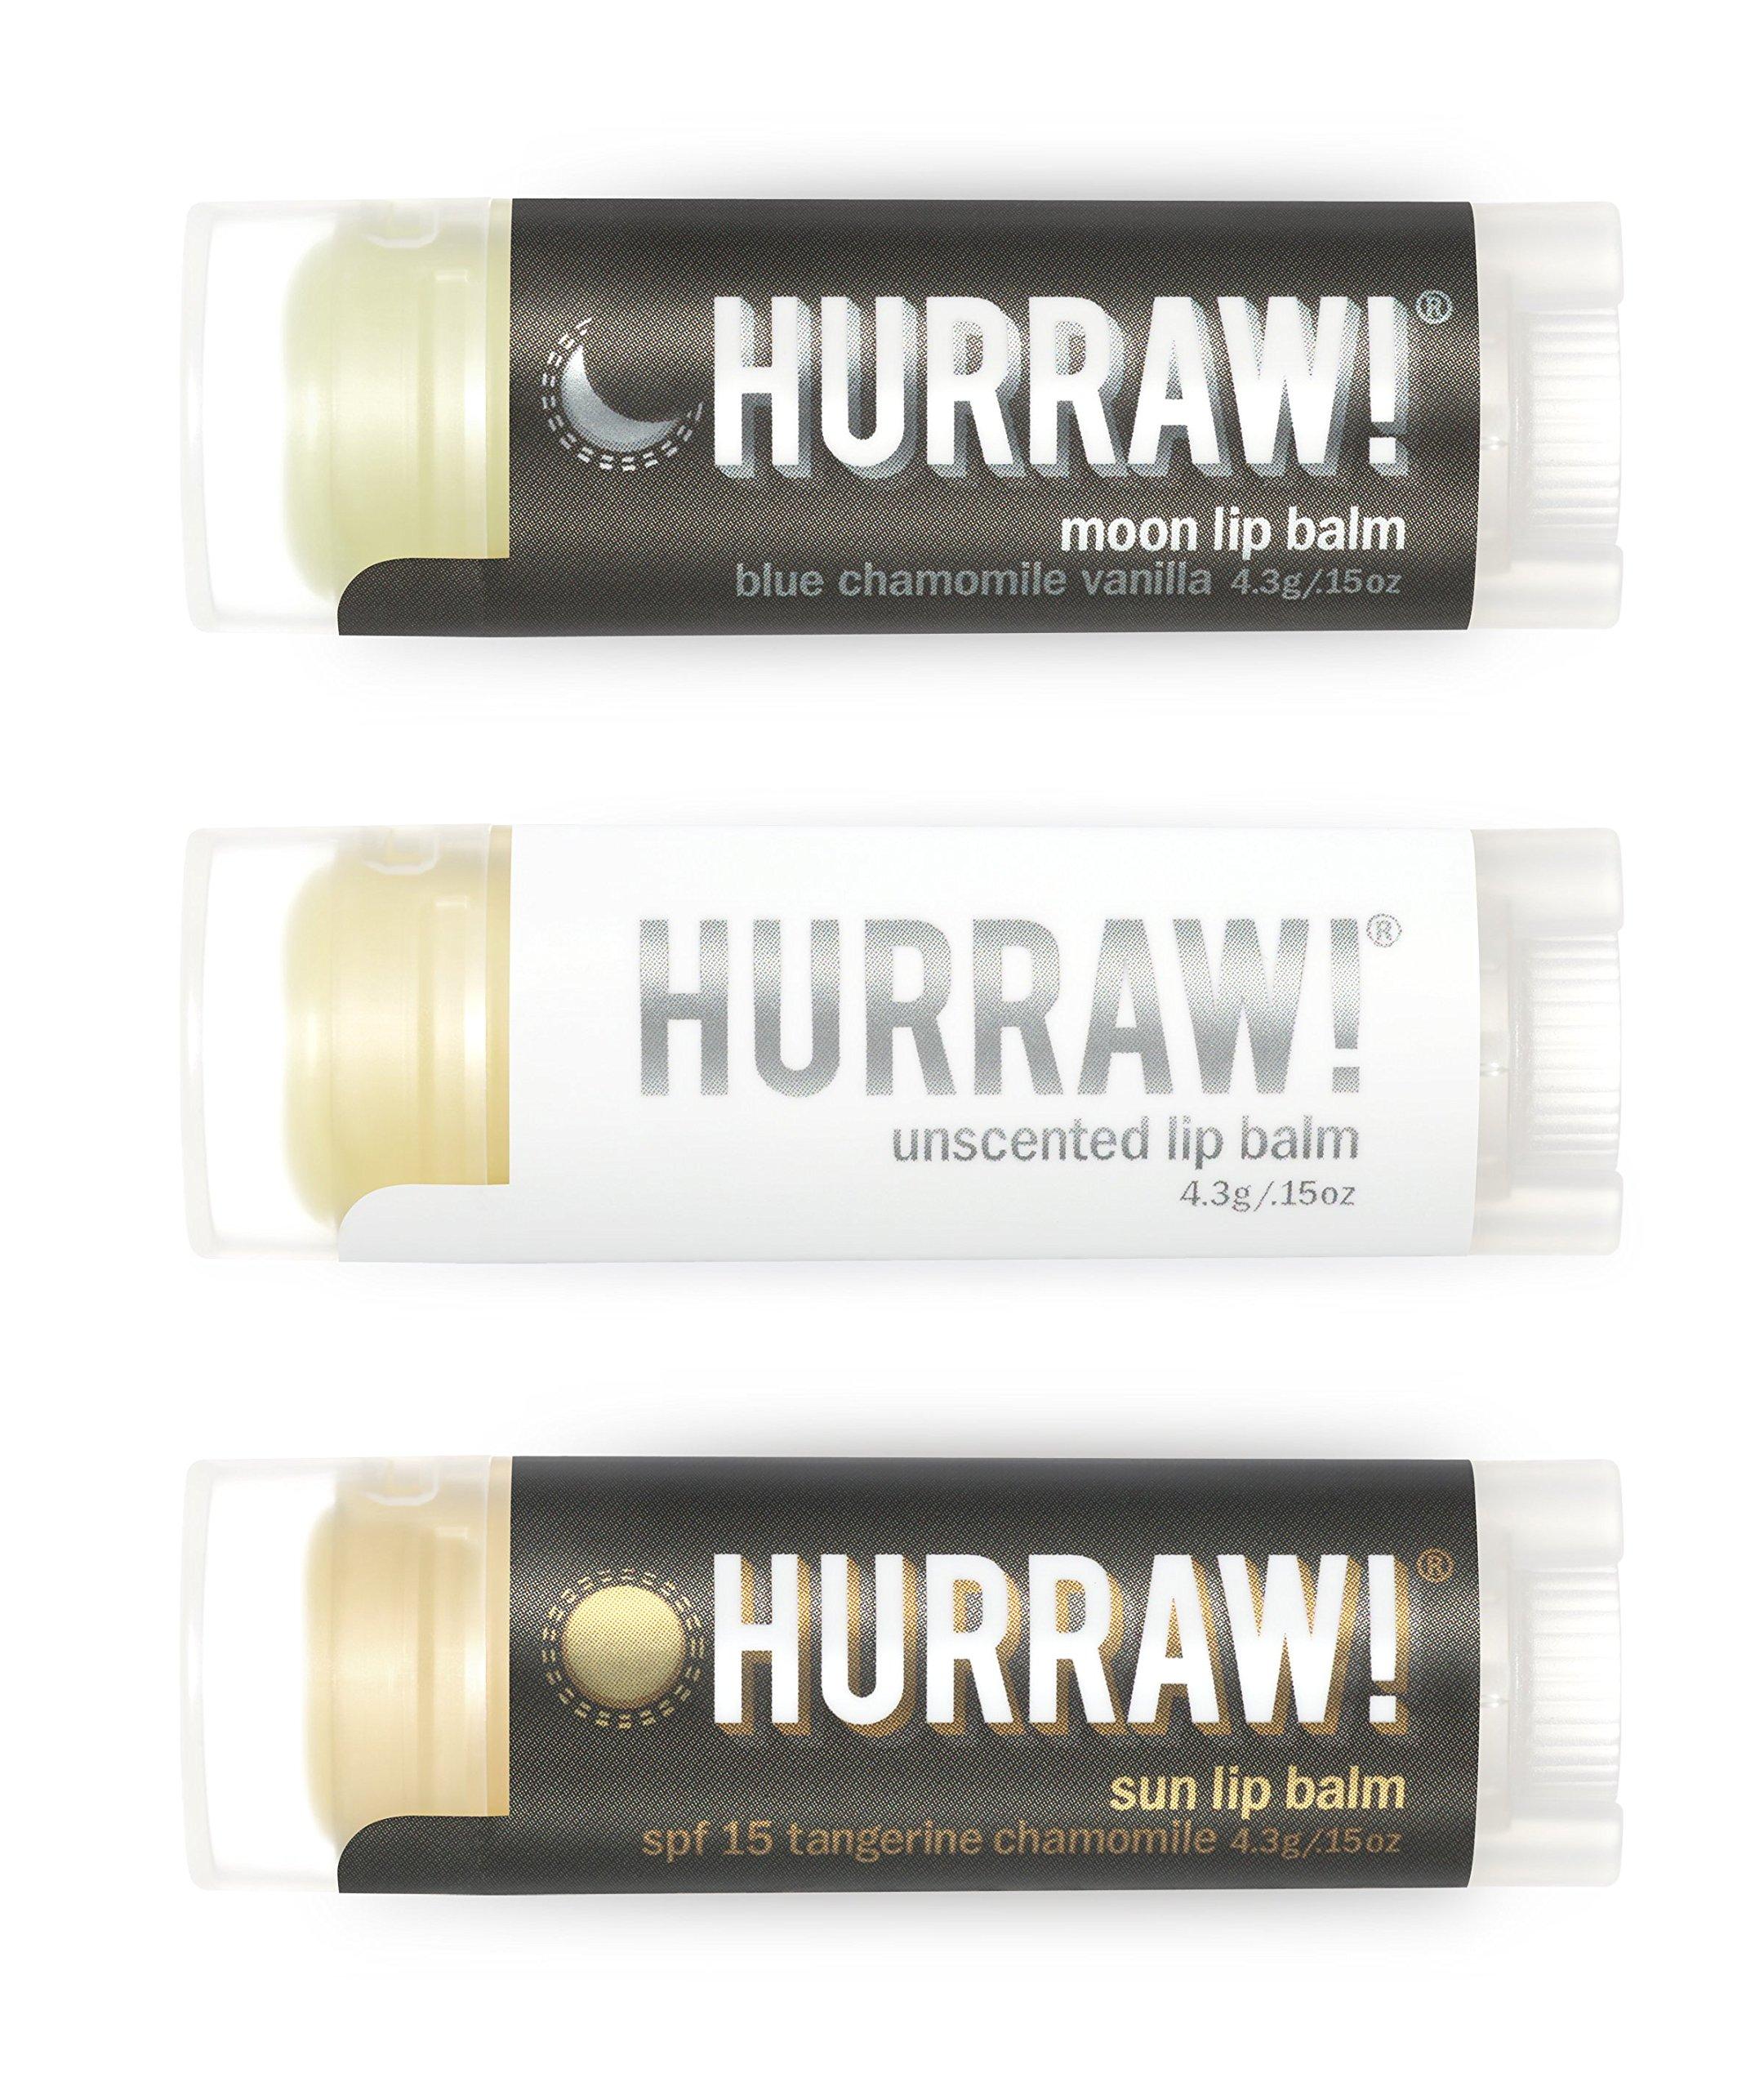 HURRAW! Moon, Unscented, Sun Lip Balms Bundle: Sunscreen, SPF 15, Zinc Oxide Sun Protection, Organic, Vegan, Non-GMO, Gluten Free, Natural, Luxury Lip Balm Made in USA – MOON, UNSCENTED, SUN (3 Pack)